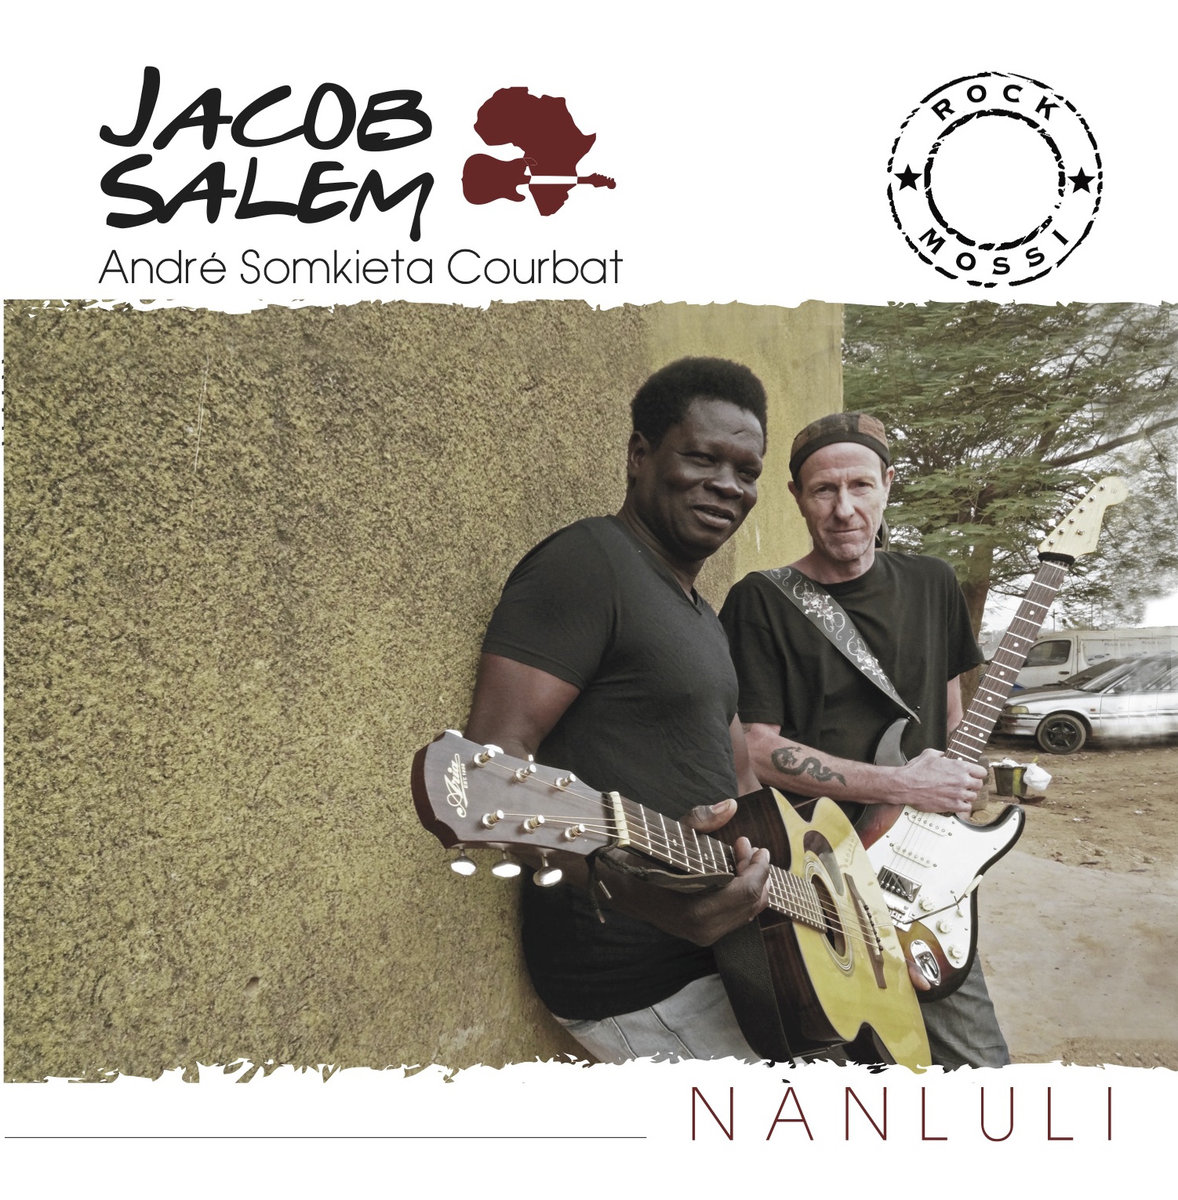 Jacob Salem & Somkieta Nanluli